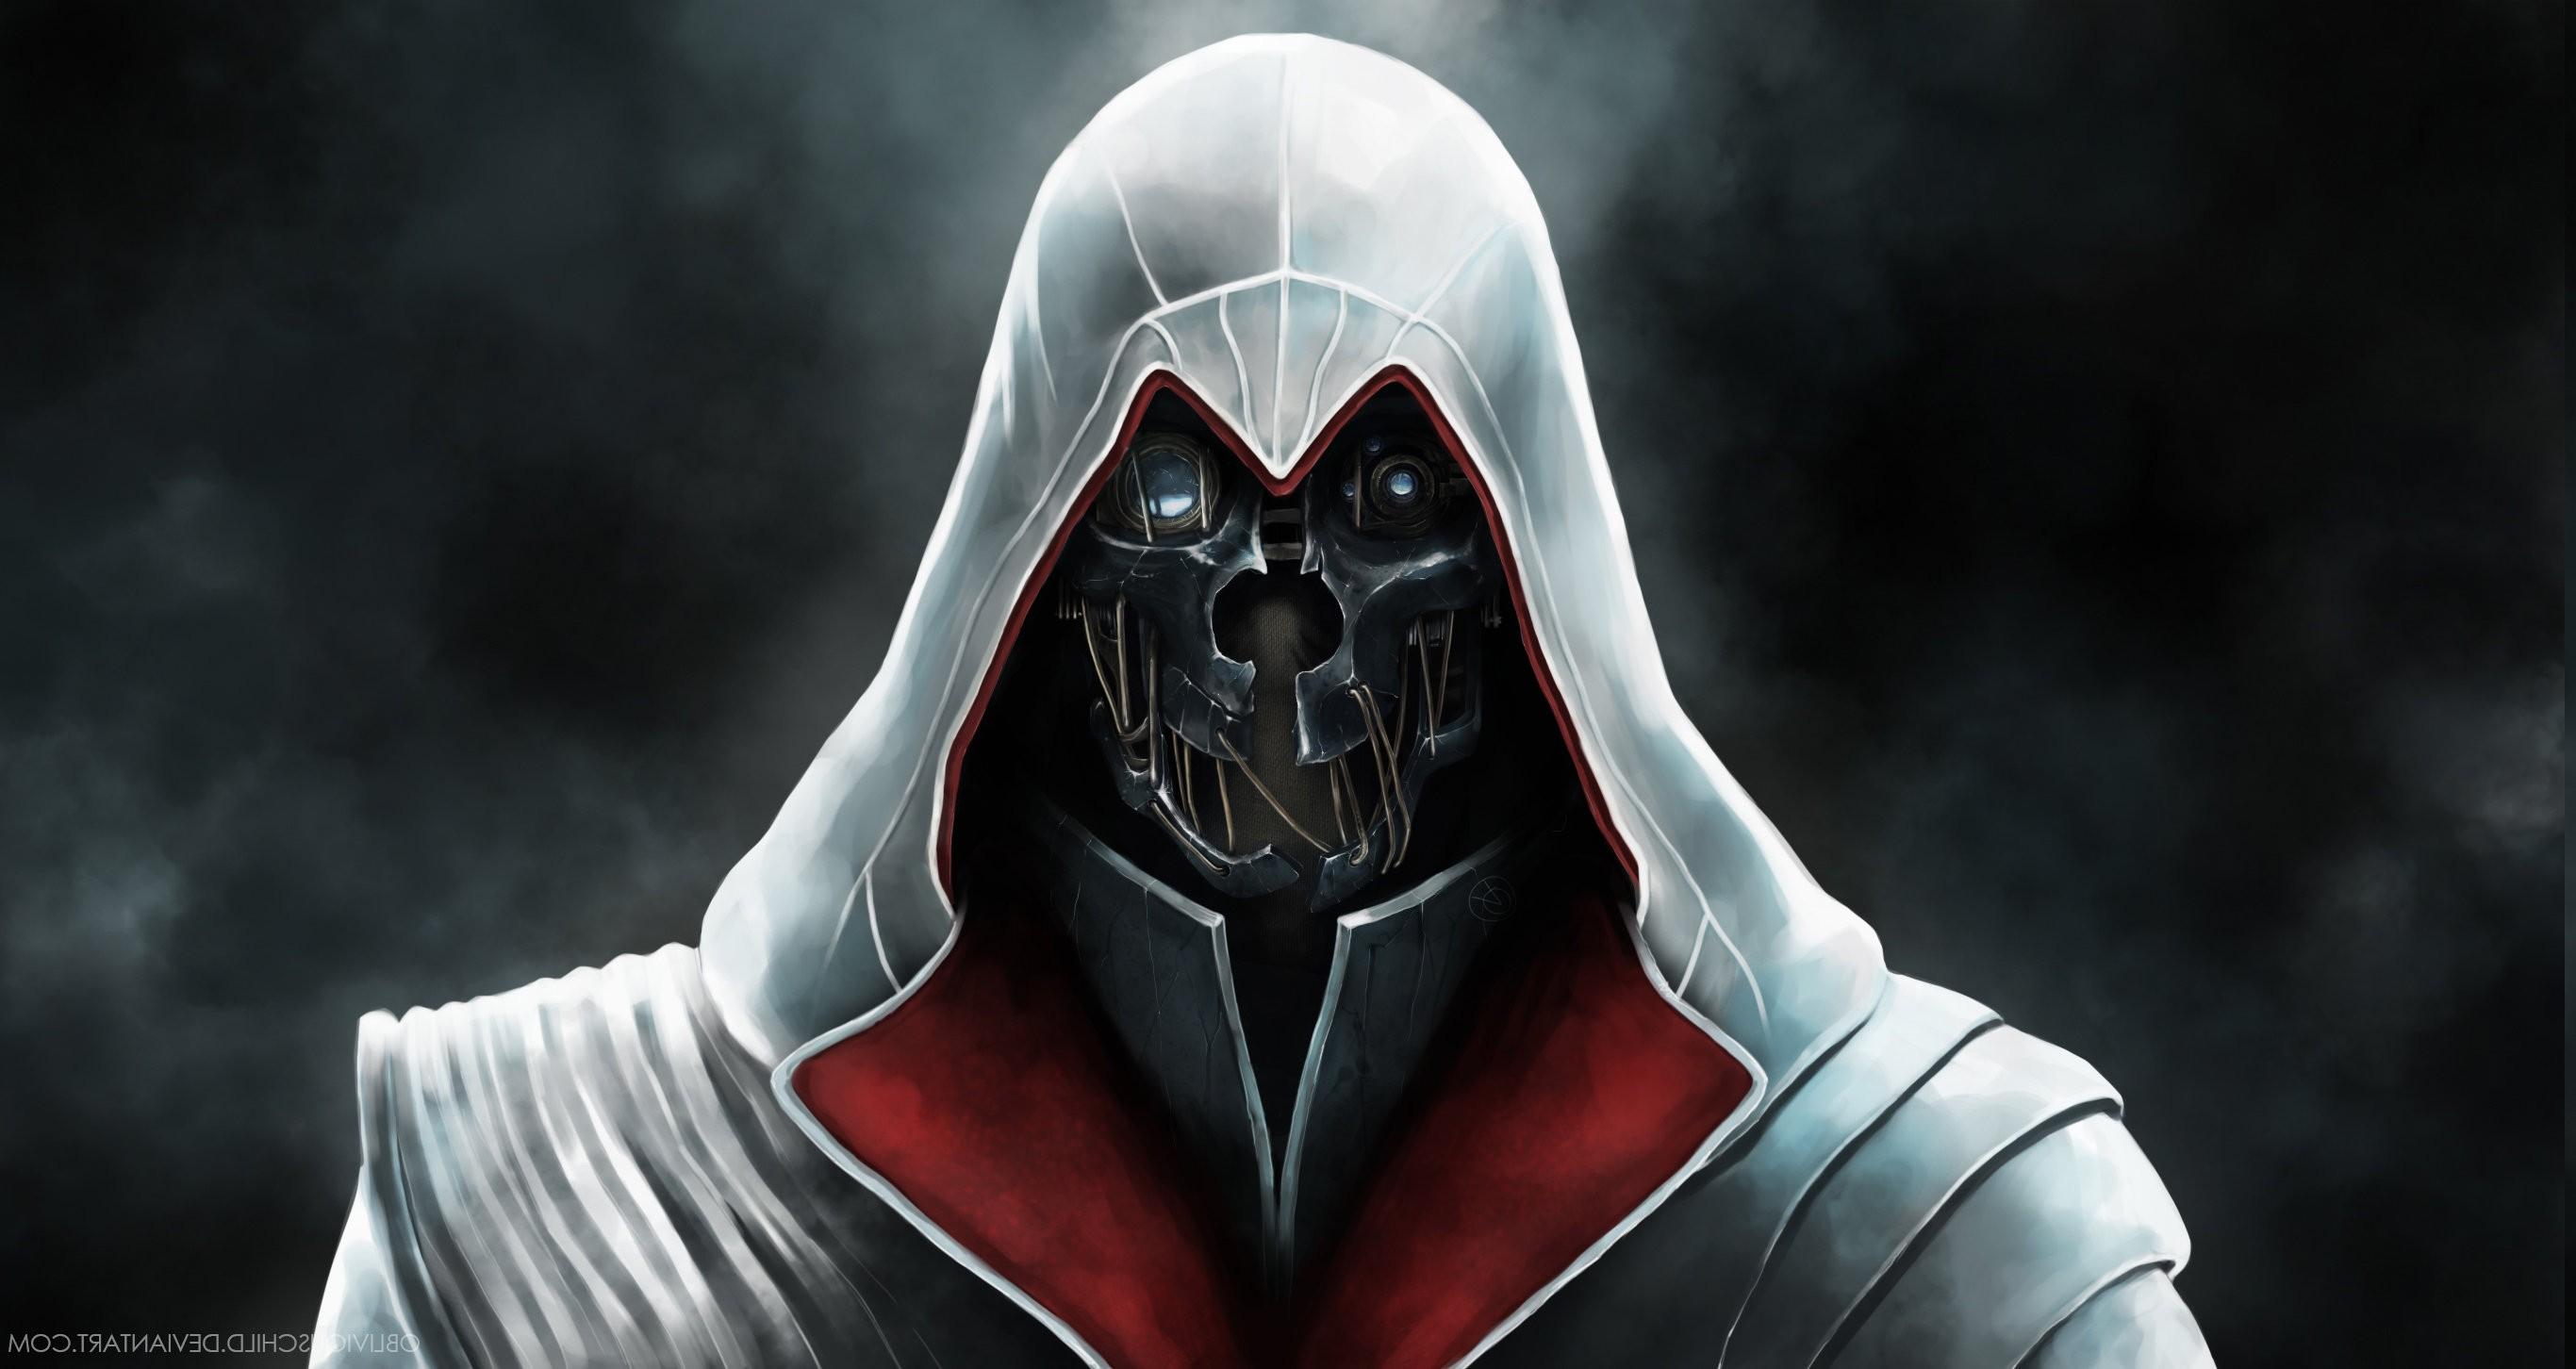 wallpaper : video games, anime, dishonored, darkness, screenshot